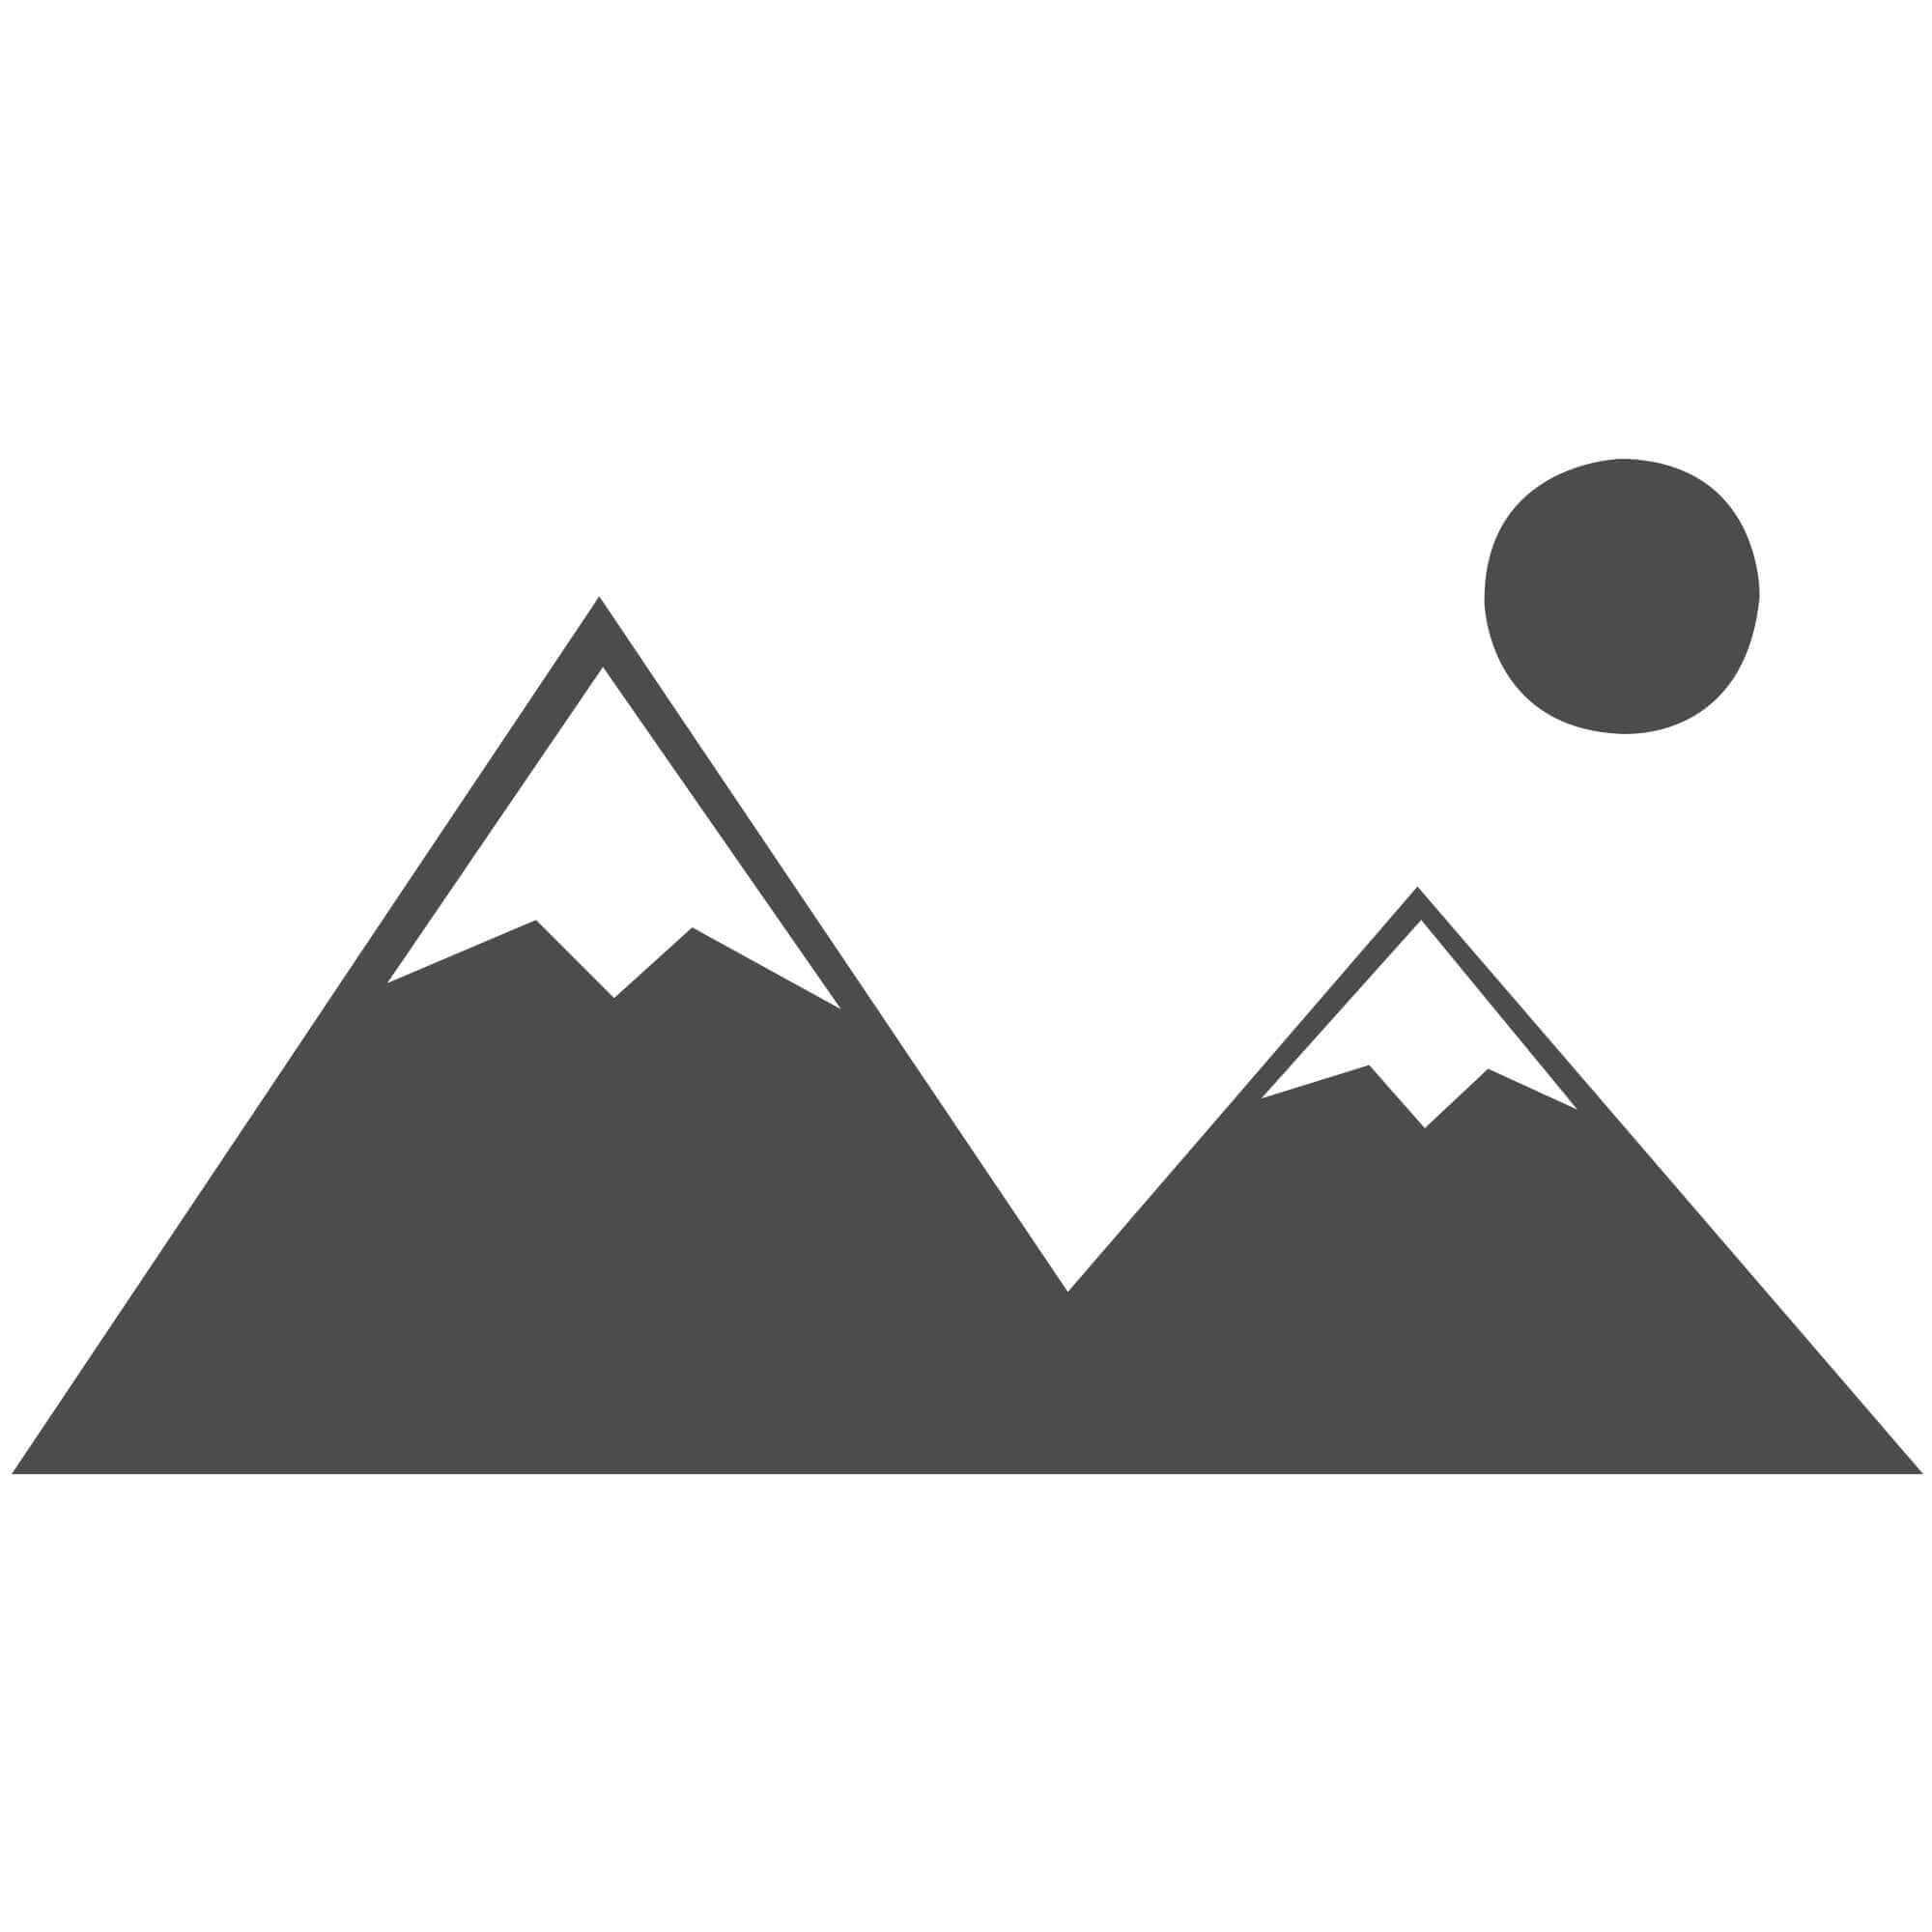 RHINO HEX 55 Adjustable Cross Bar Bracket